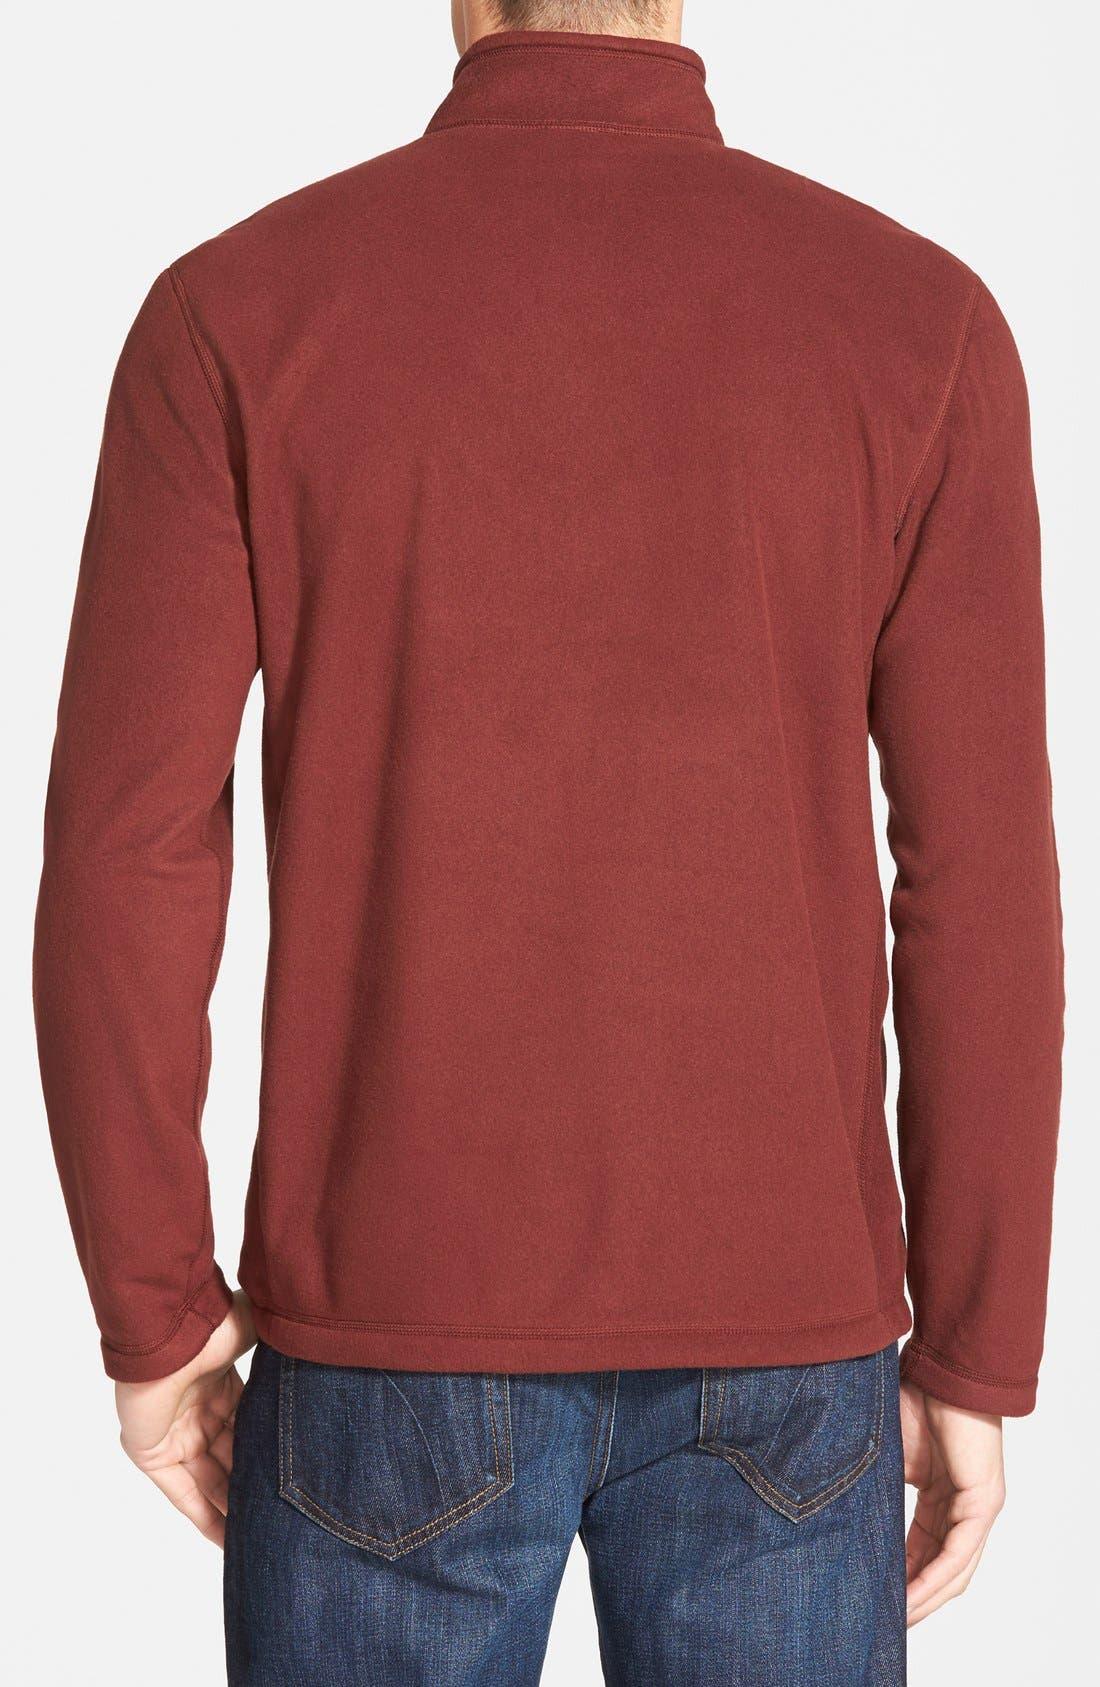 'TKA 100 Glacier' Quarter Zip Fleece Pullover,                             Alternate thumbnail 91, color,